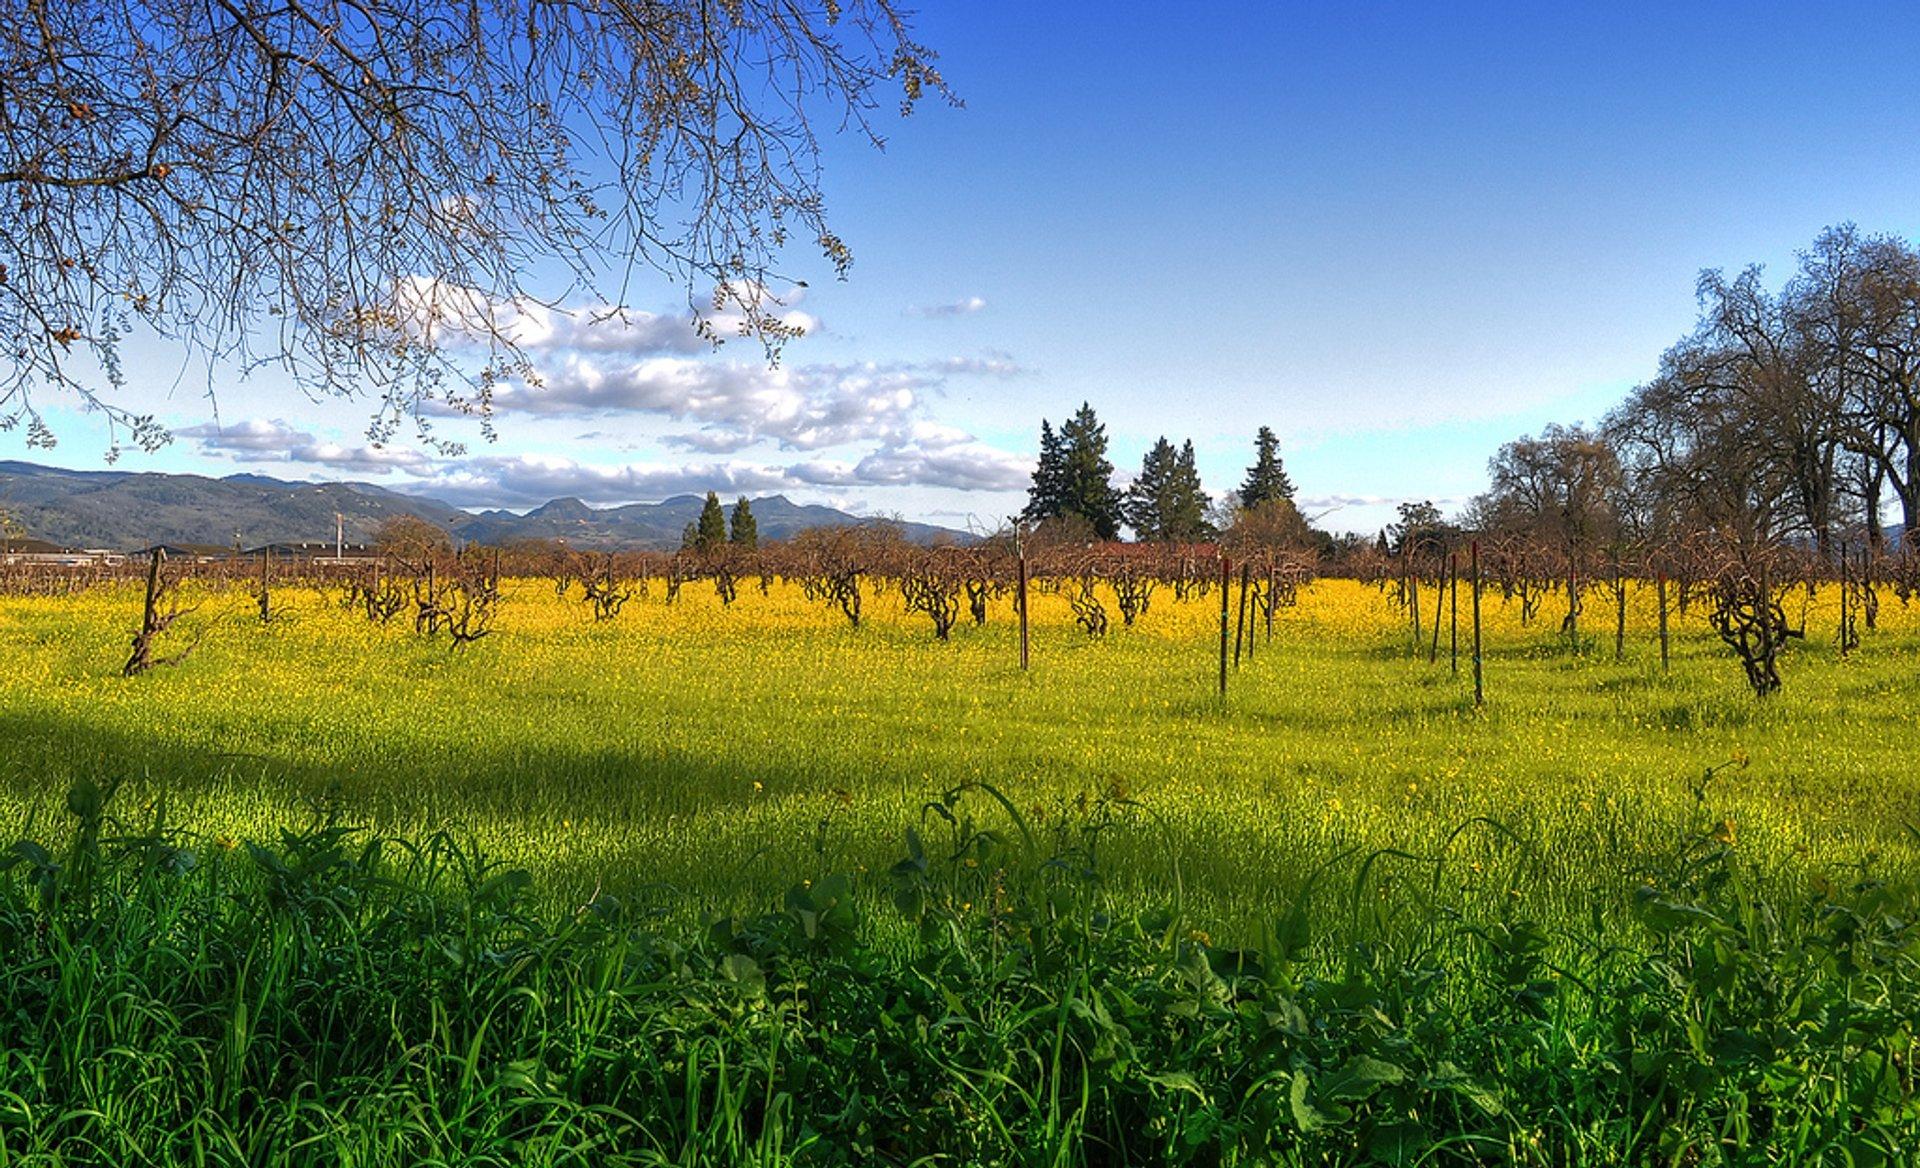 Napa vineyard with mustard flowers